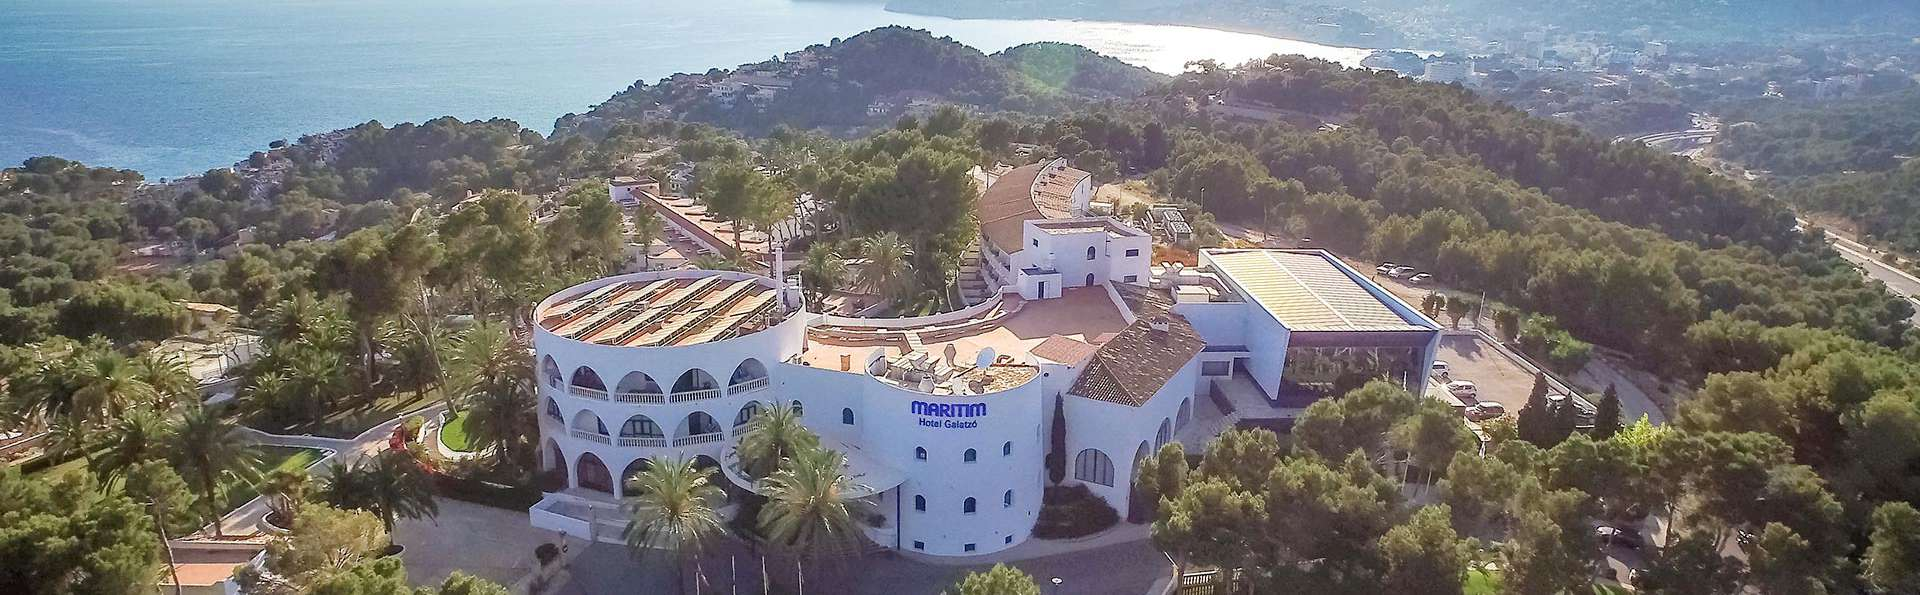 Maritim Hotel Galatzó - EDIT_FRONT_01.jpg